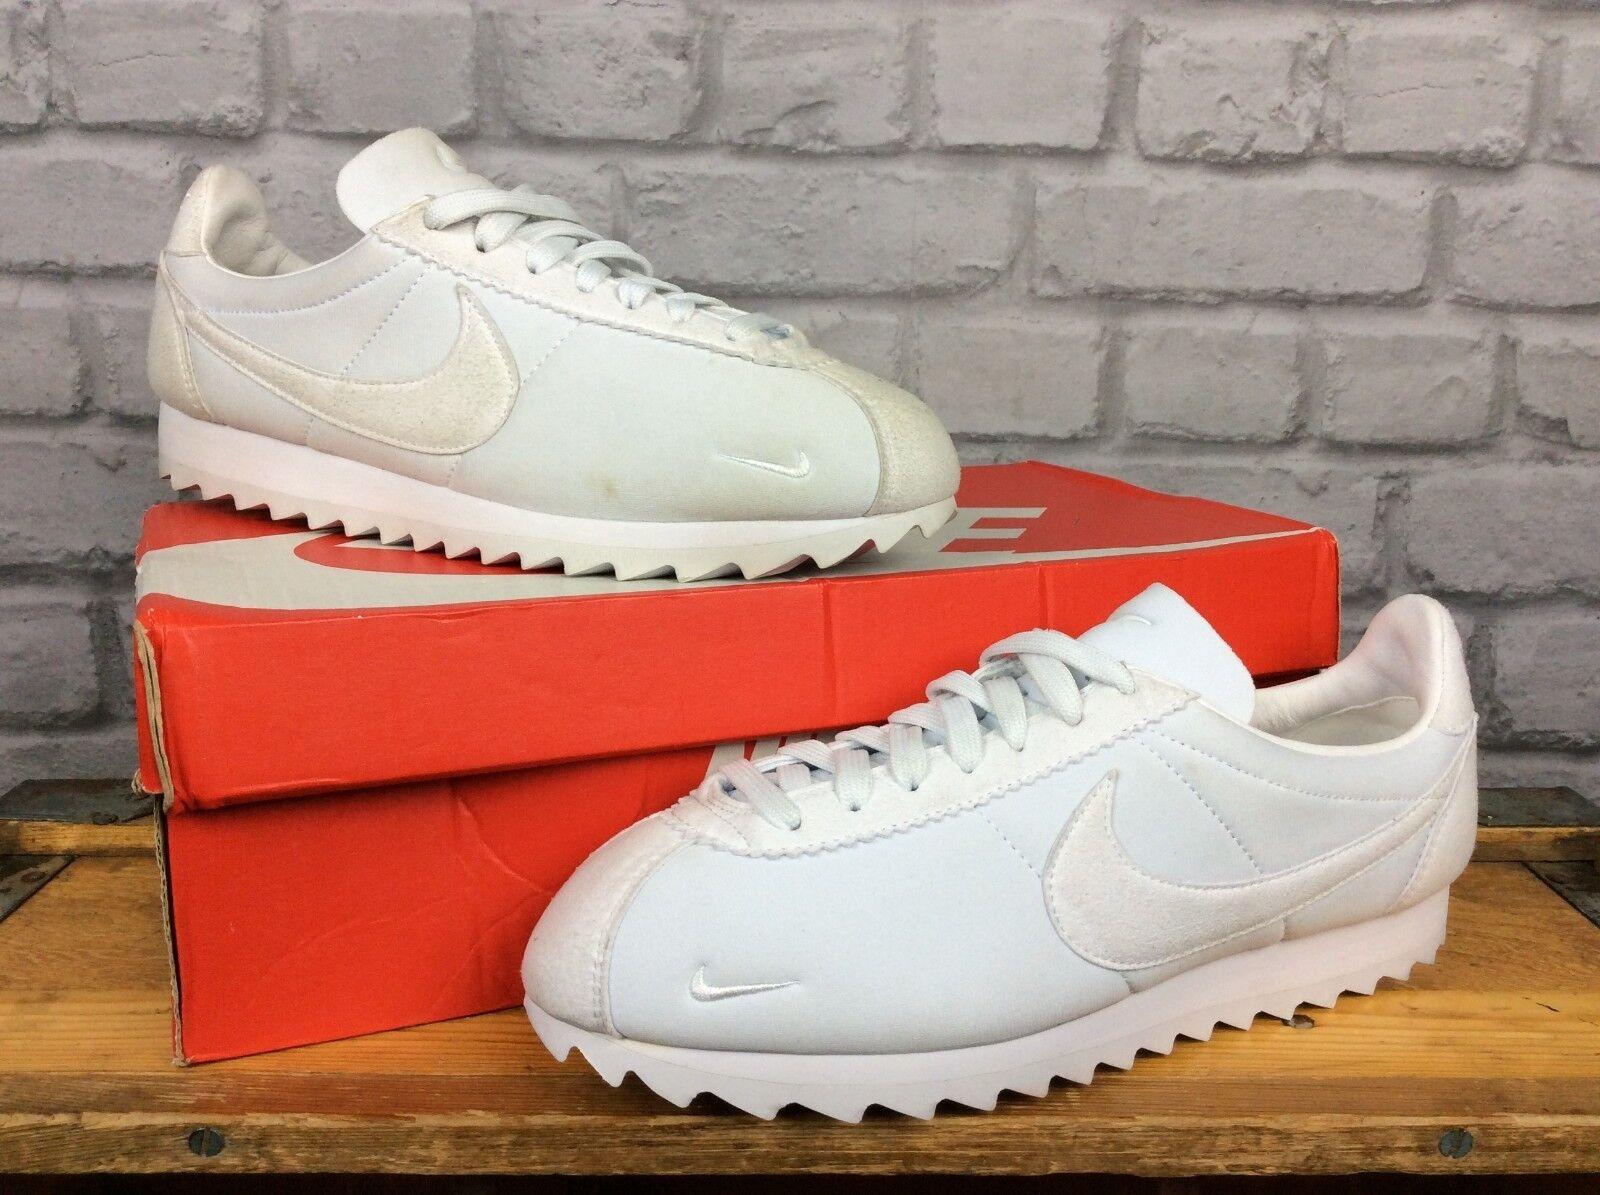 Nike Hombre UE Cortez 42.5 ante de Nylon Blanco Clásico Cortez UE Phylon entrenadores 79a560